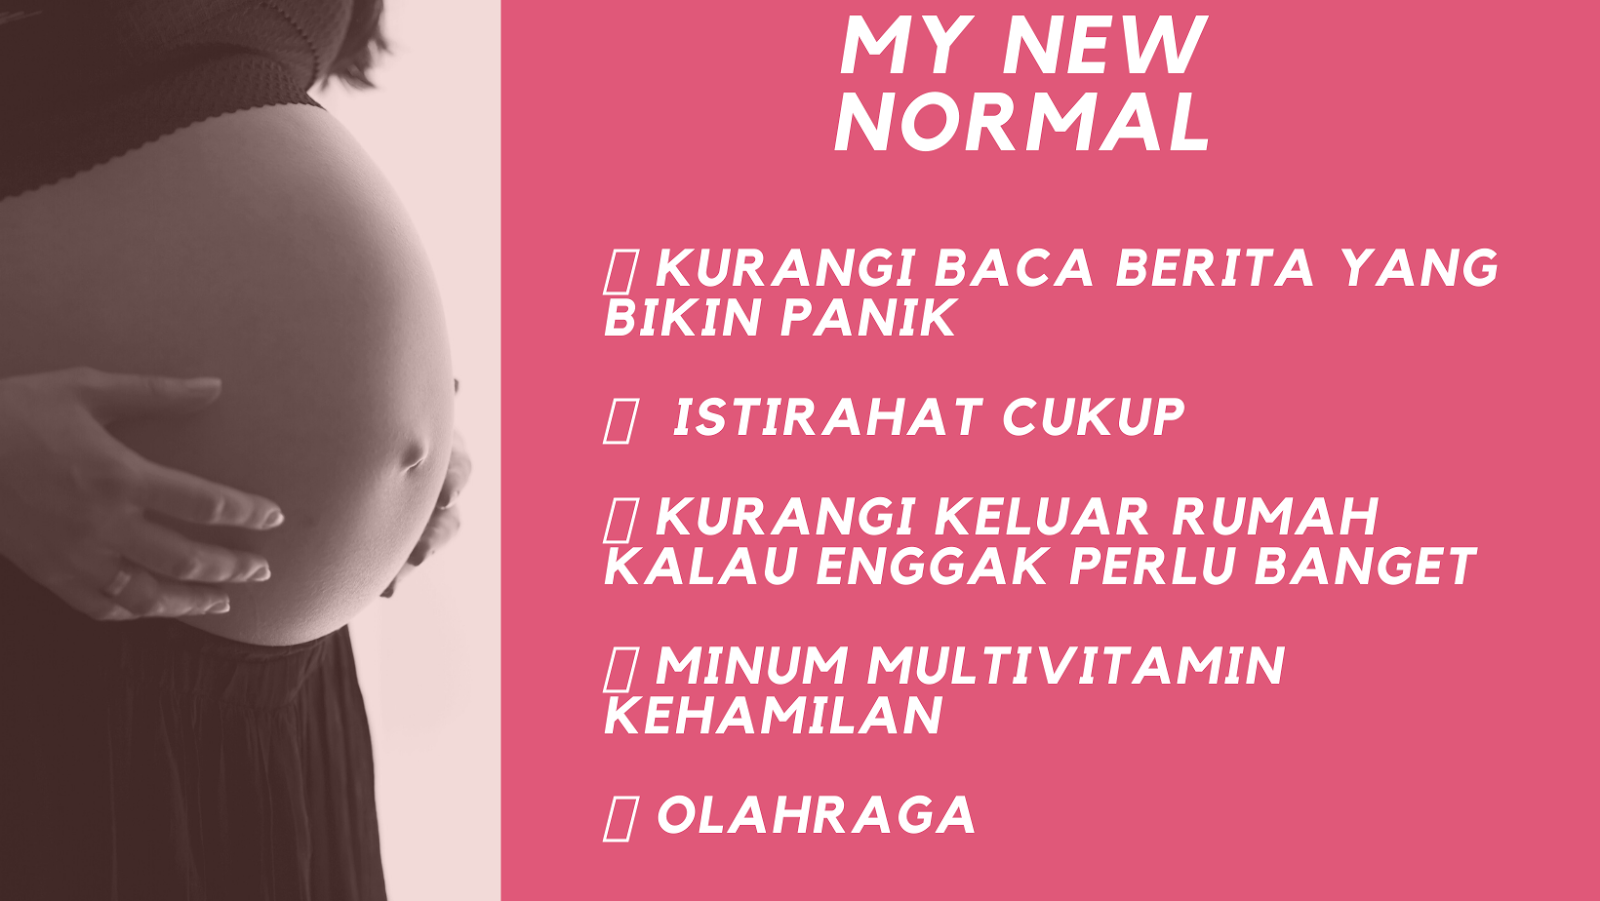 kebiasaan new normal ibu hamil